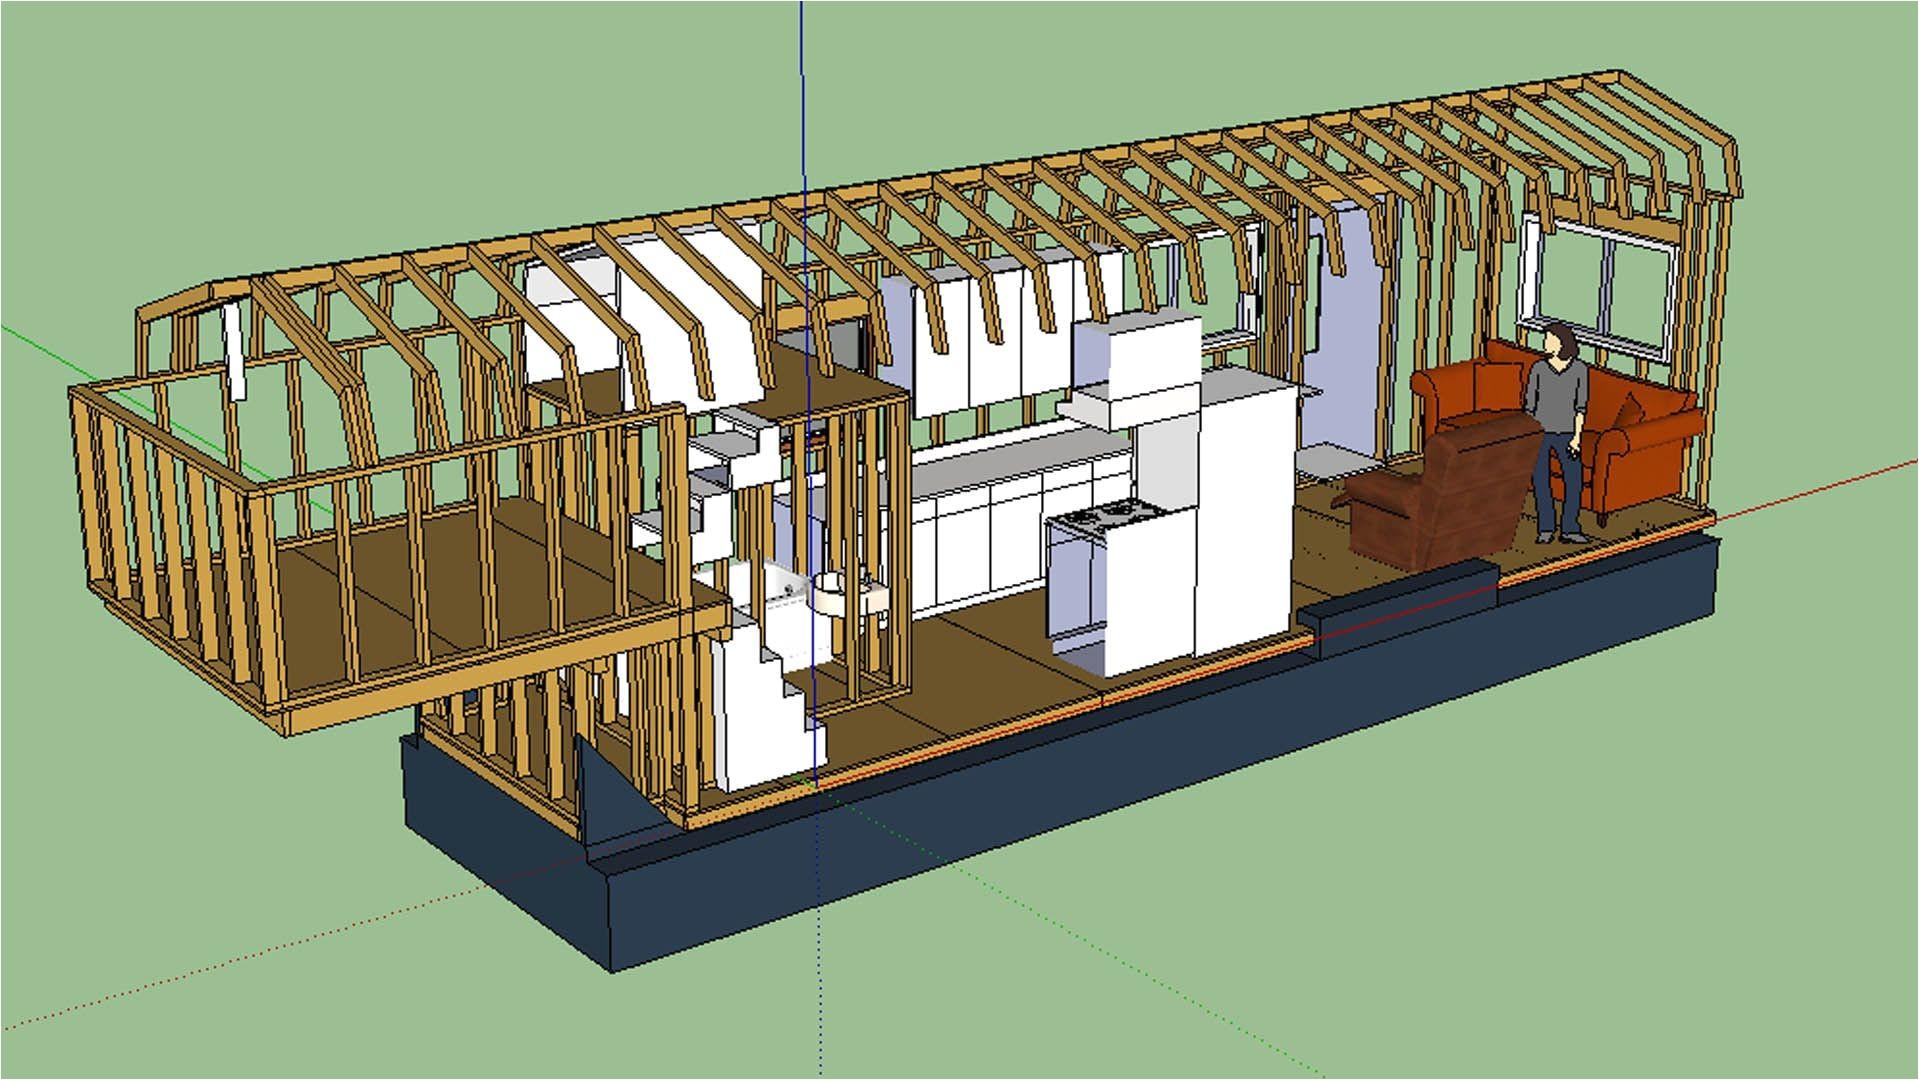 Gooseneck Tiny Home Plans Awesome Tiny House Design On A Gooseneck Trailer